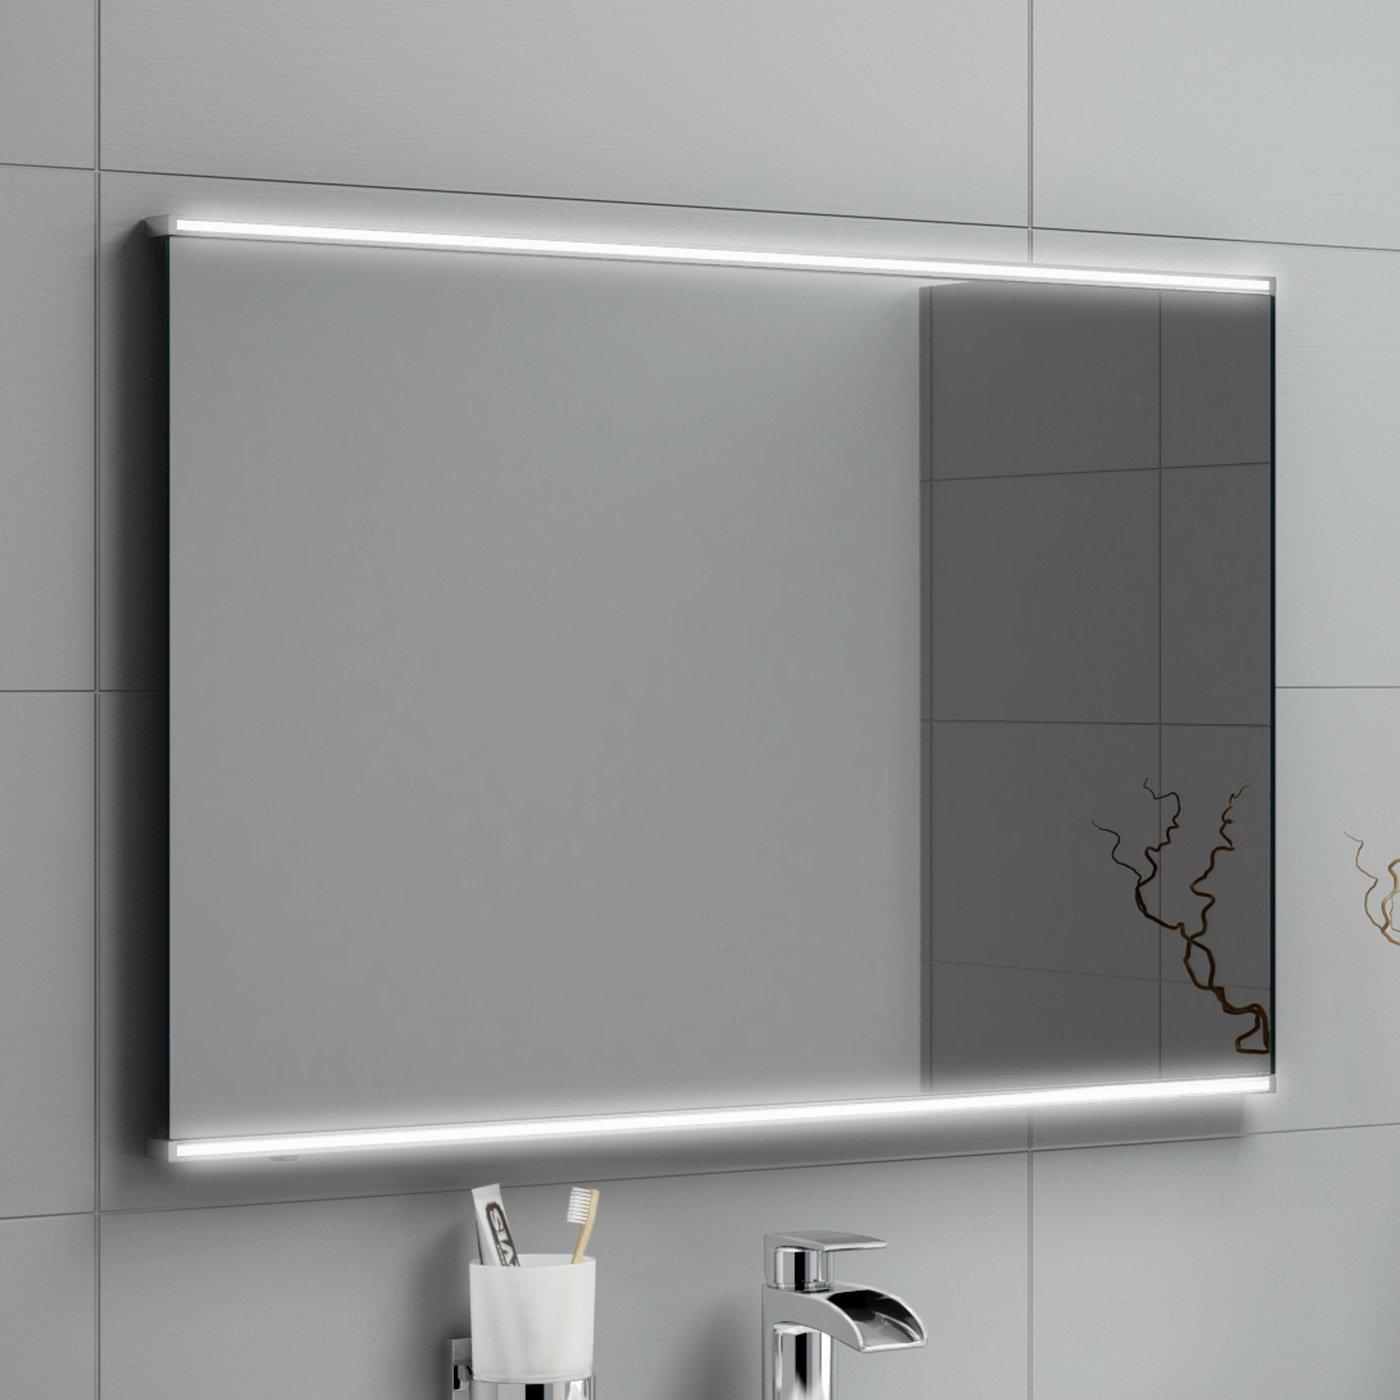 500 X 700 Mm Modern Illuminated Led Bathroom Mirror Light Sensor + Demister  Ml3003: Ibathuk: Amazon: Kitchen & Home